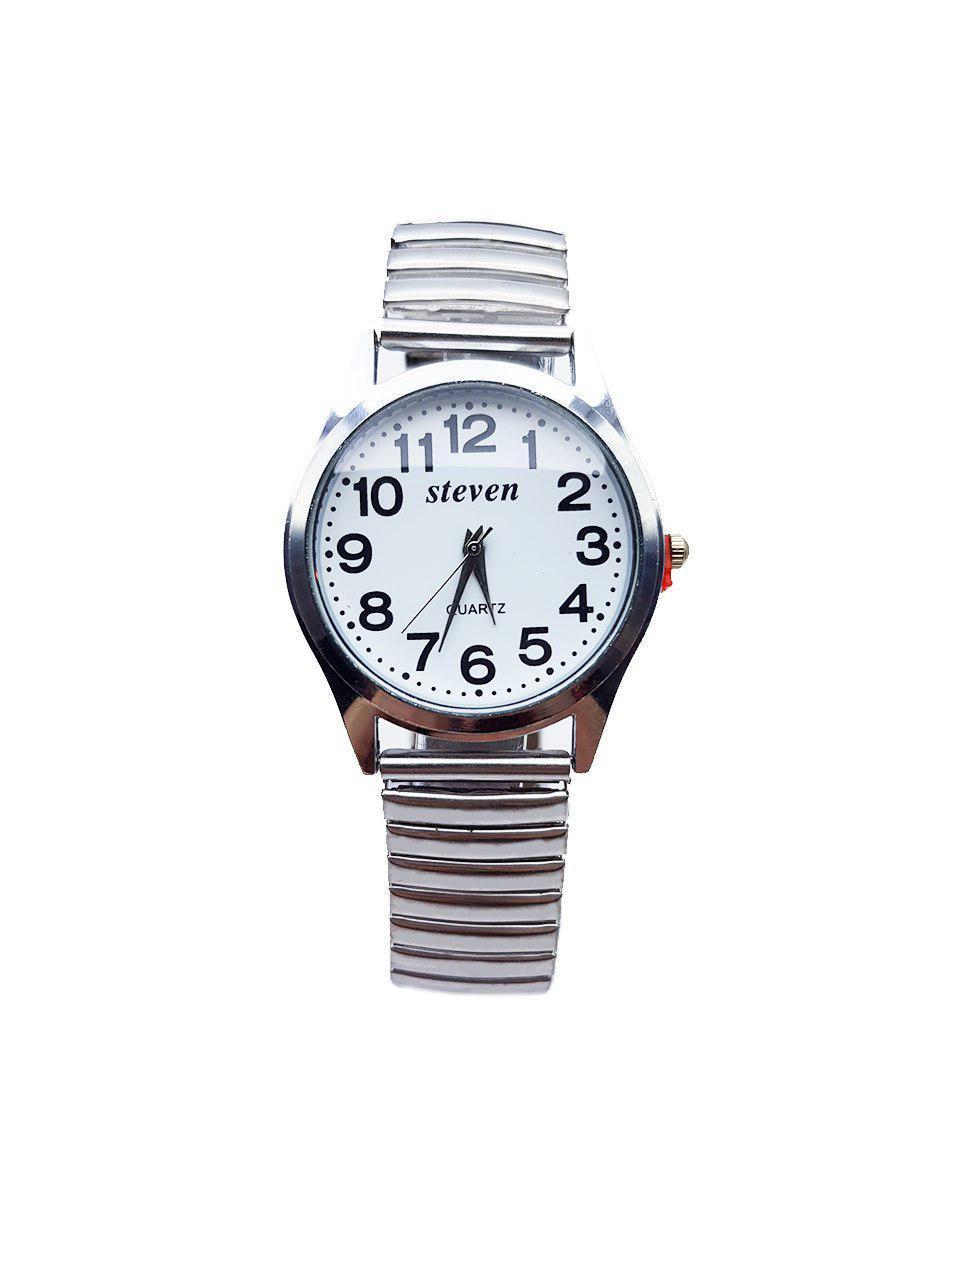 98523f3a6cbe Часы наручные женские STEVEN, кварц, серебристый цвет: продажа, цена в  Києві. ...